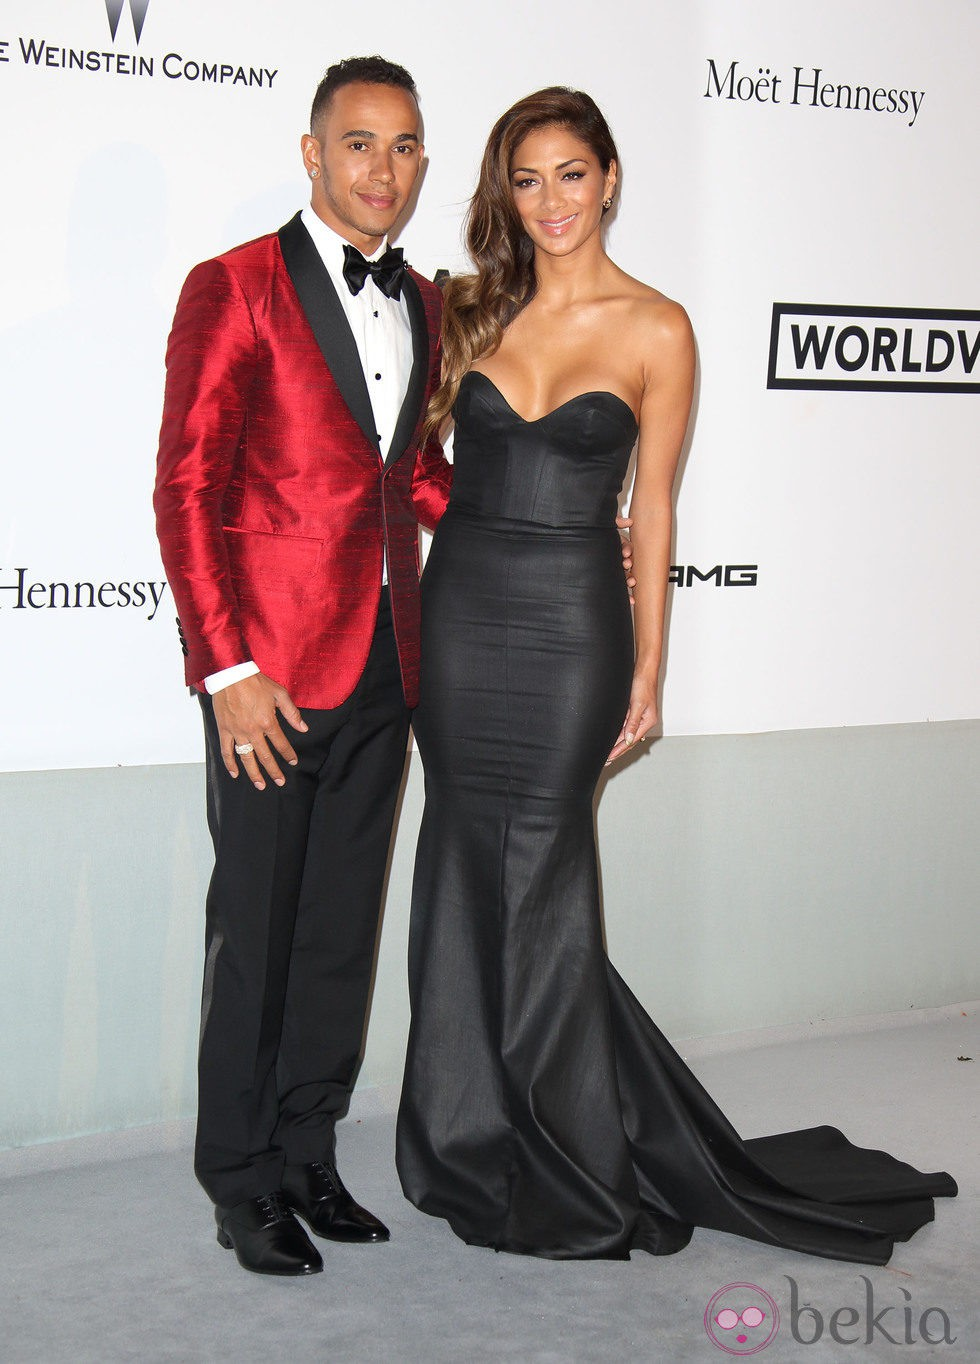 Lewis Hamilton y Nicole Scherzinger en la gala amfAR del Festival de Cannes 2014